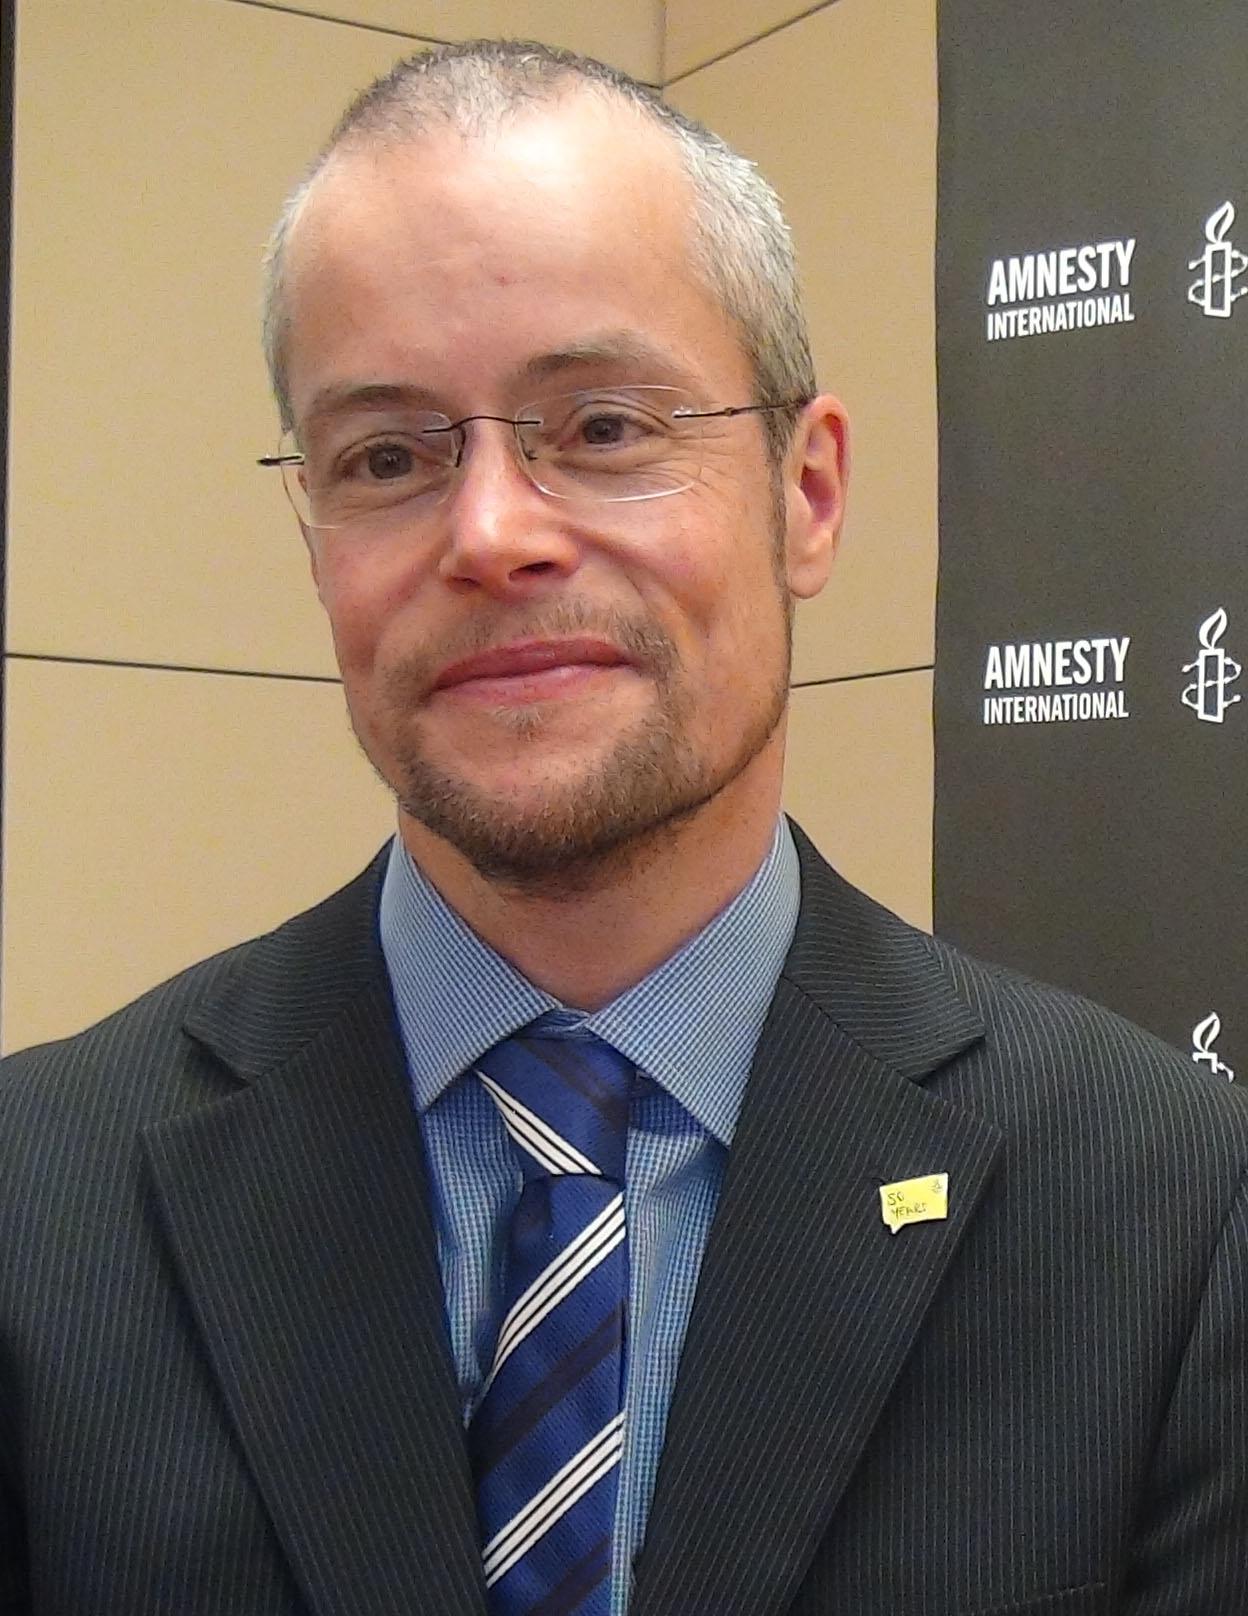 Nicolas Beger